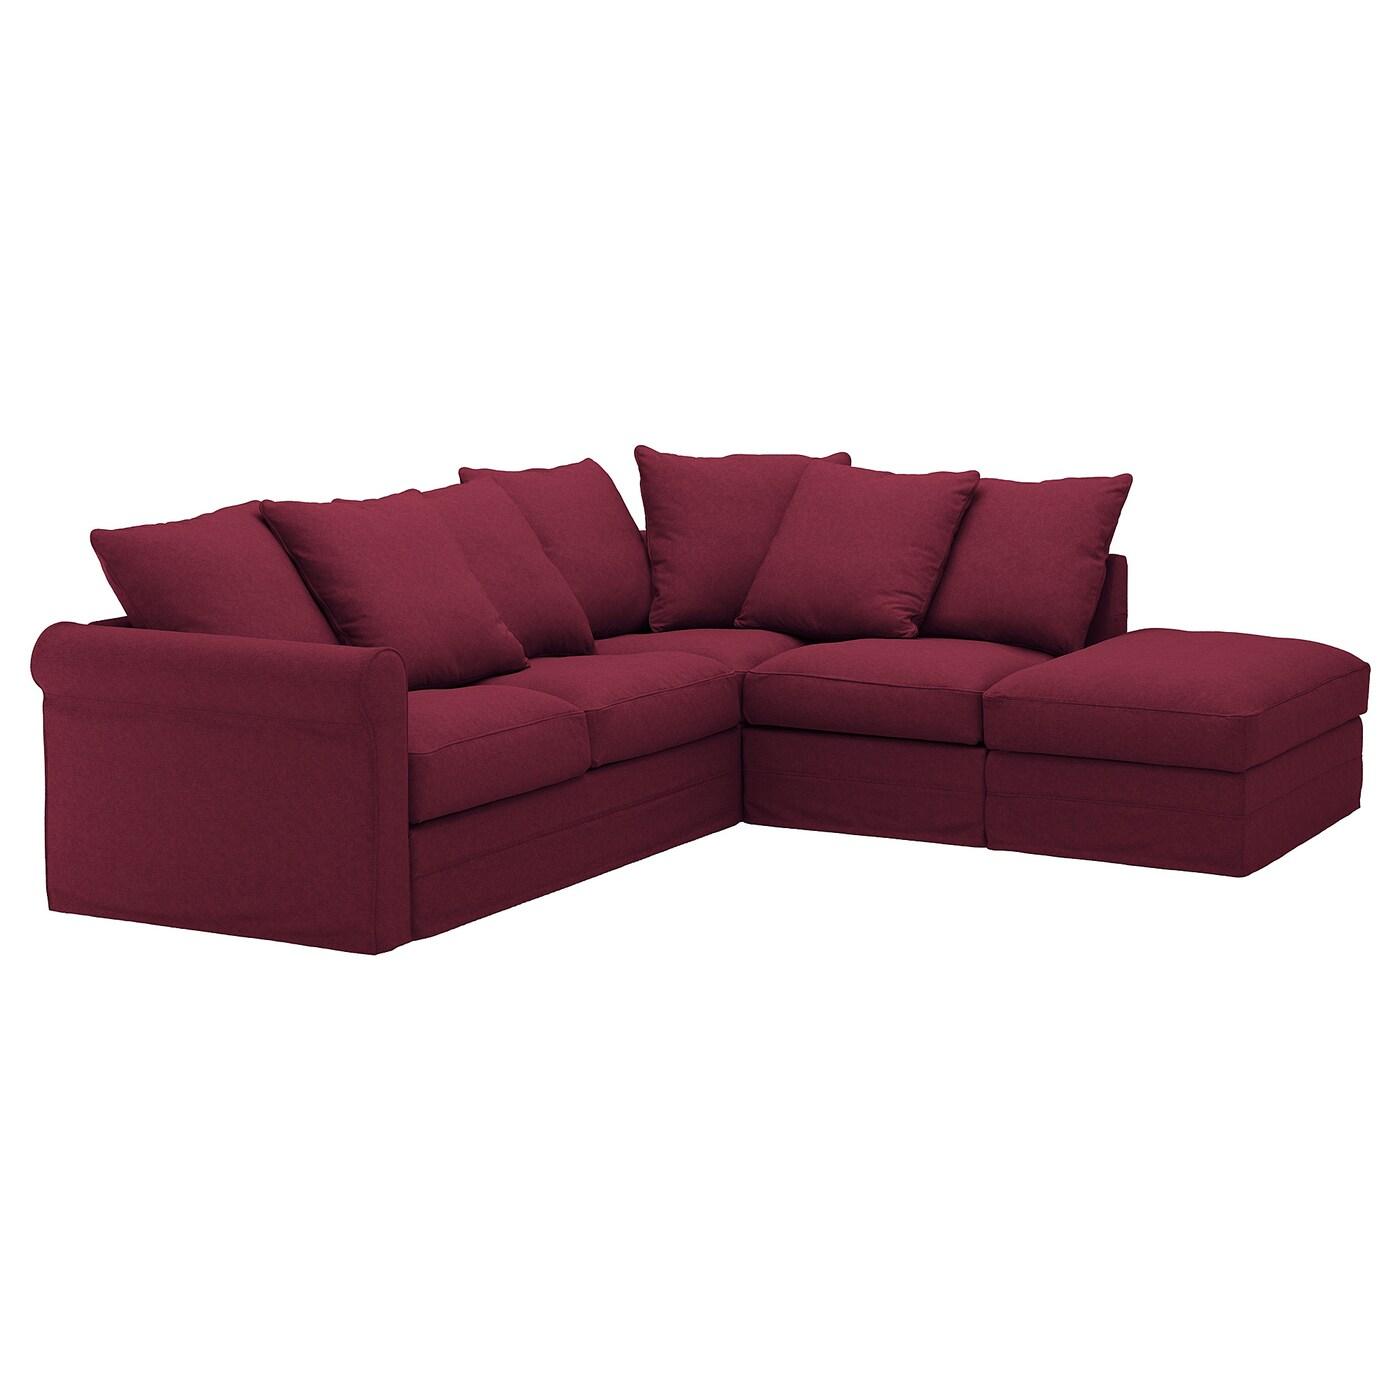 Ikea GrÖnlid Cover For Corner Sofa 4 Seat